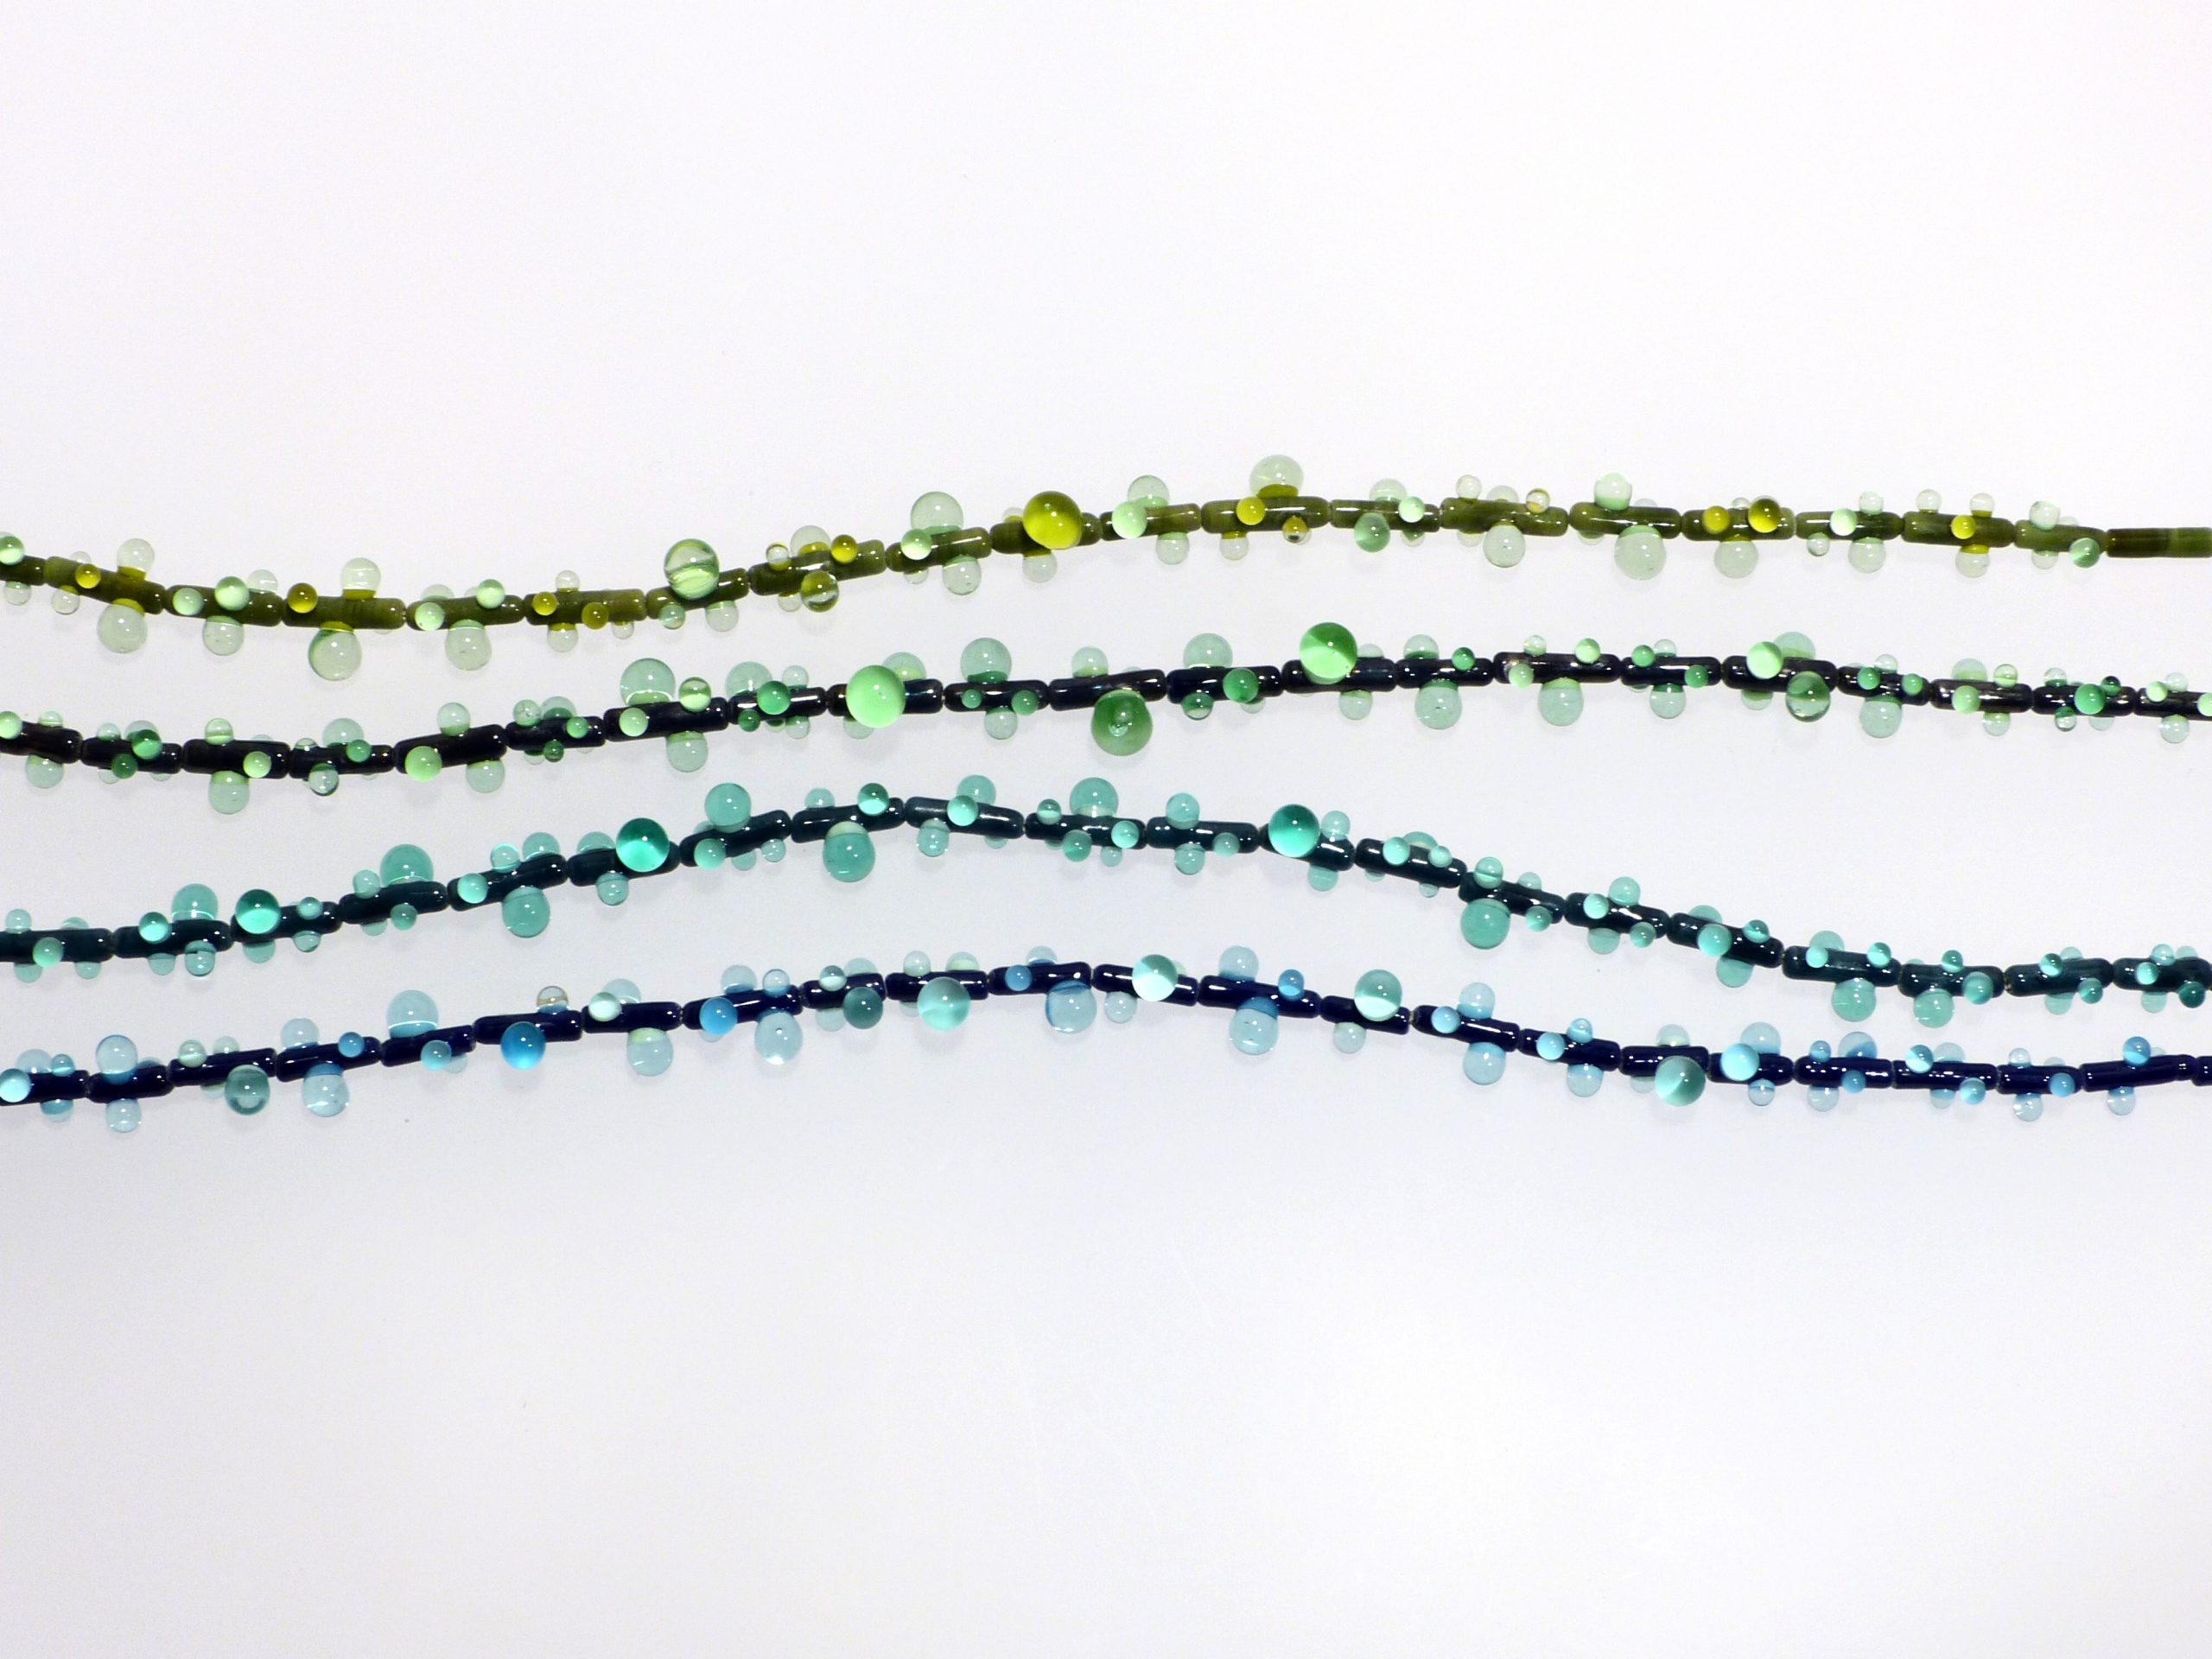 Tau 3 farbig, versch. | Glas, Stahlseil, Silber | 090997-20